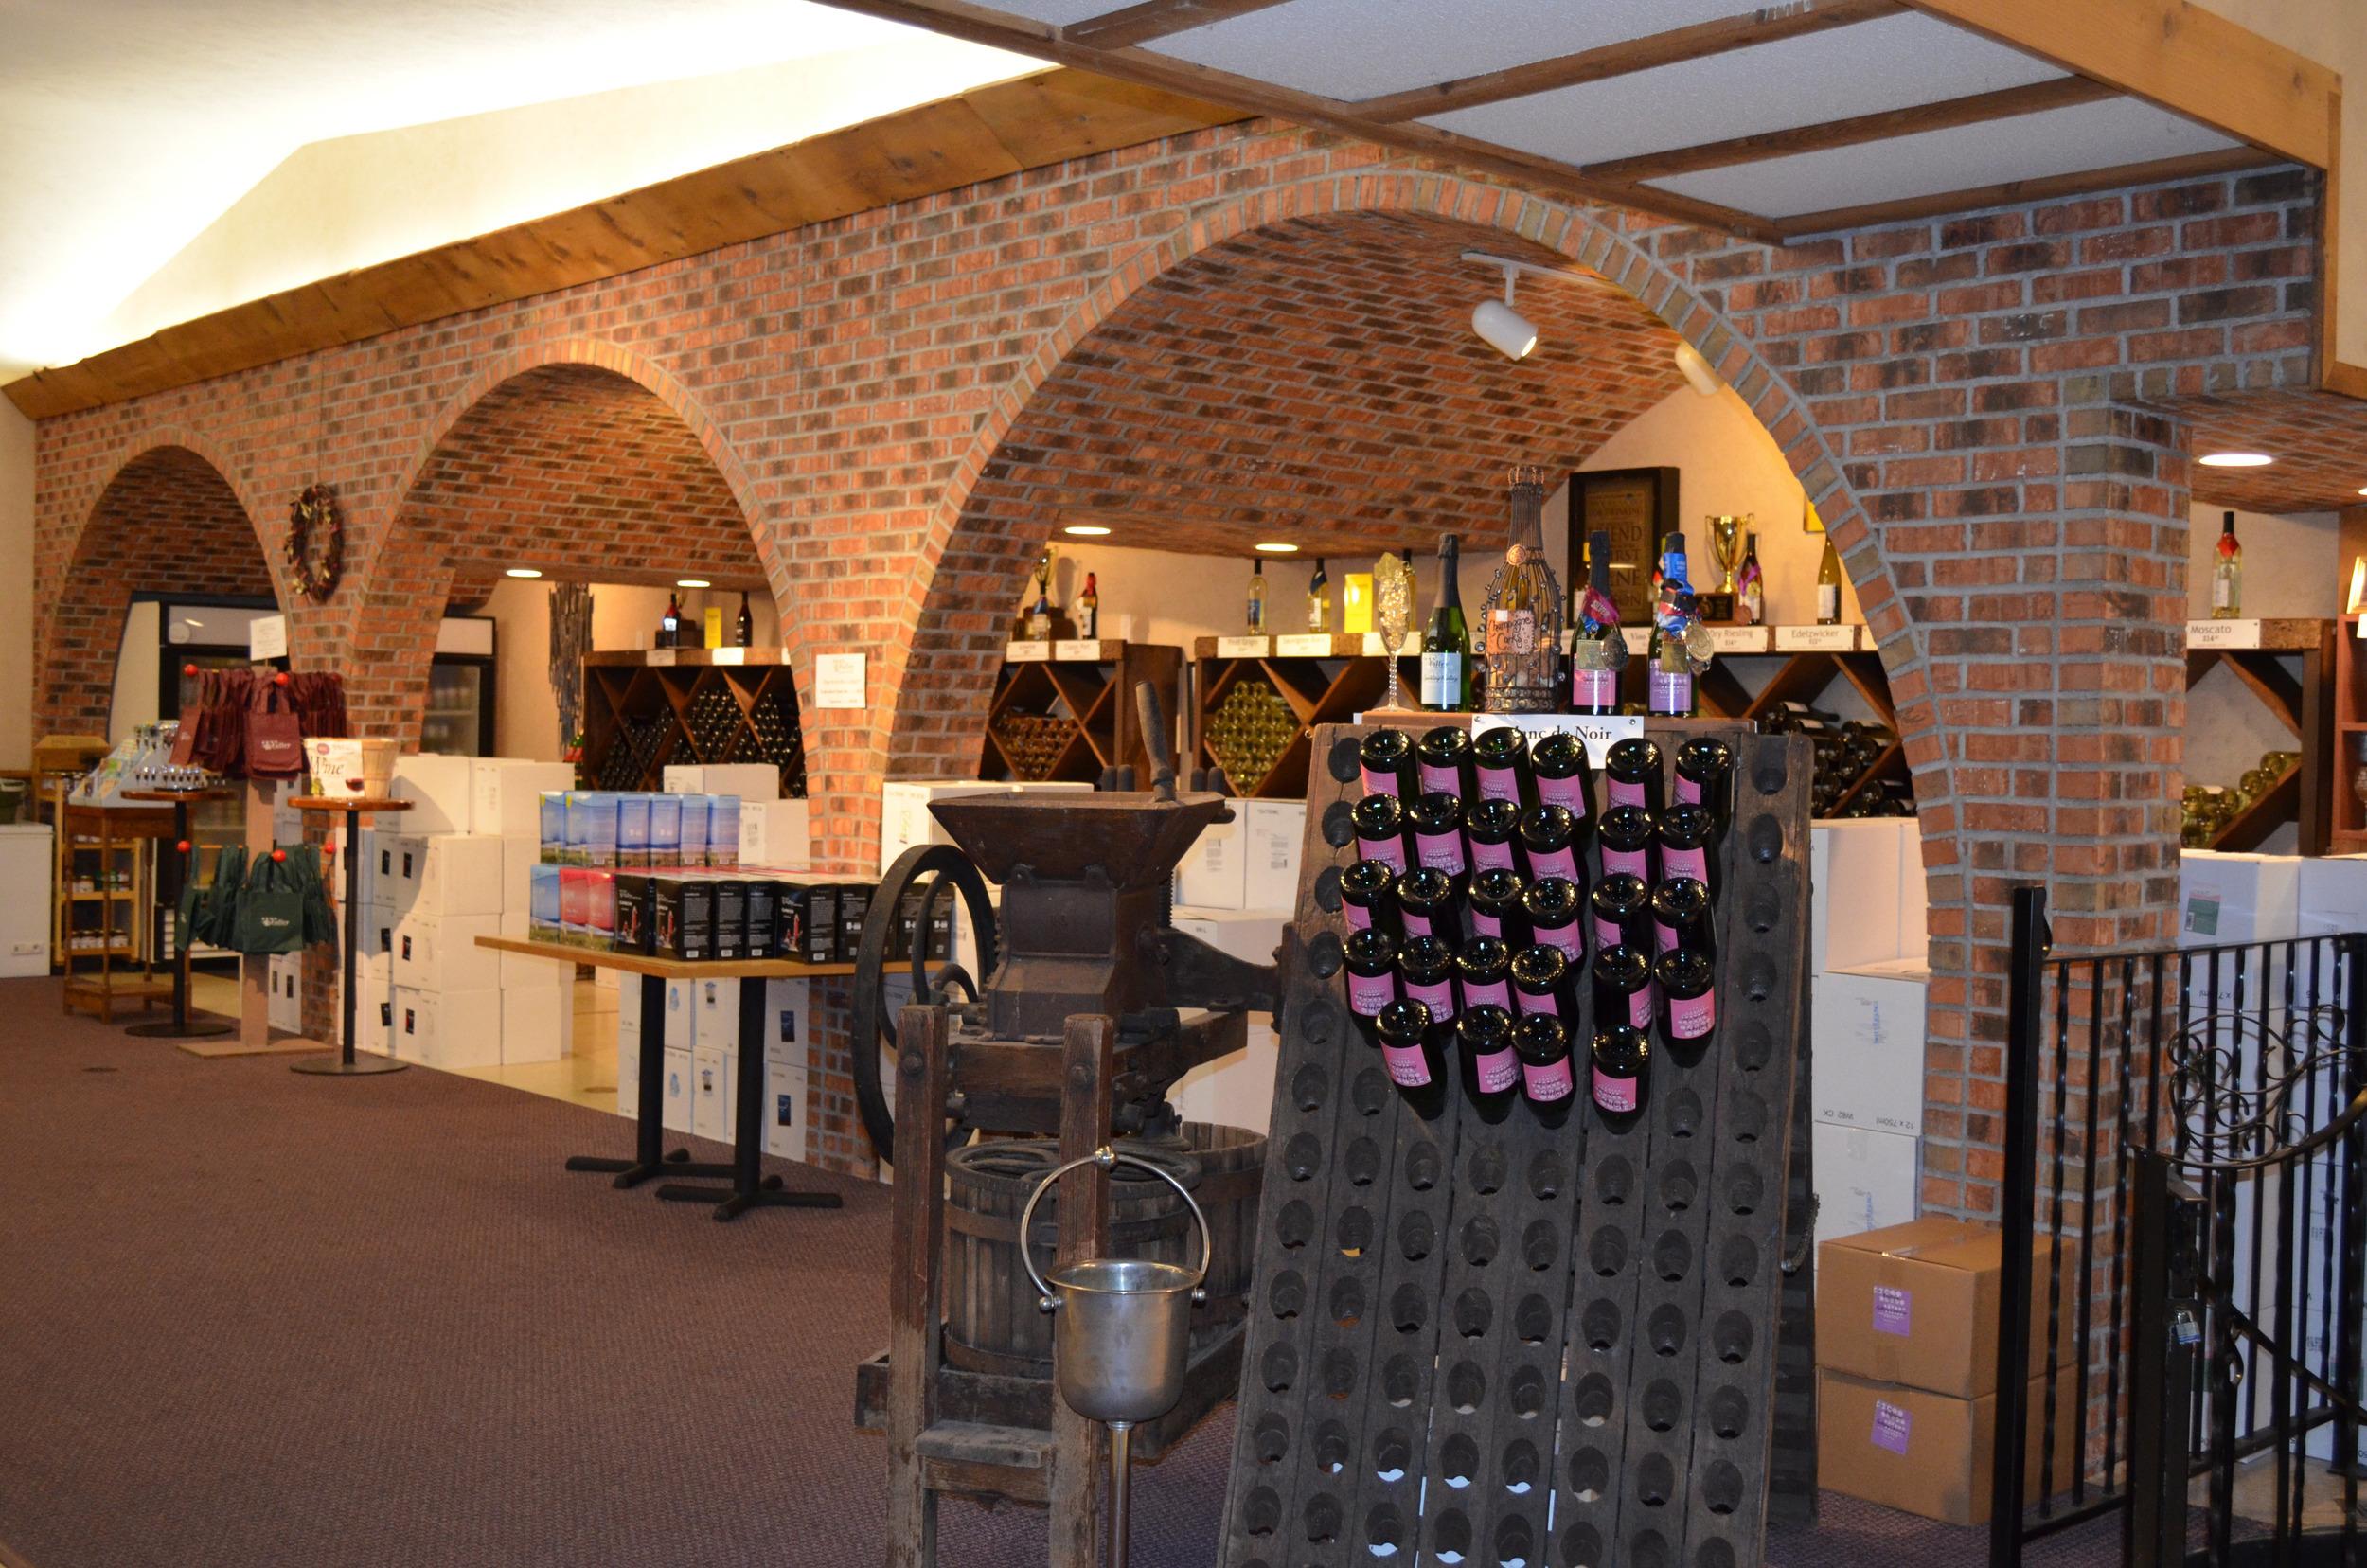 Tasting Room at Fenn Valley Vineyards